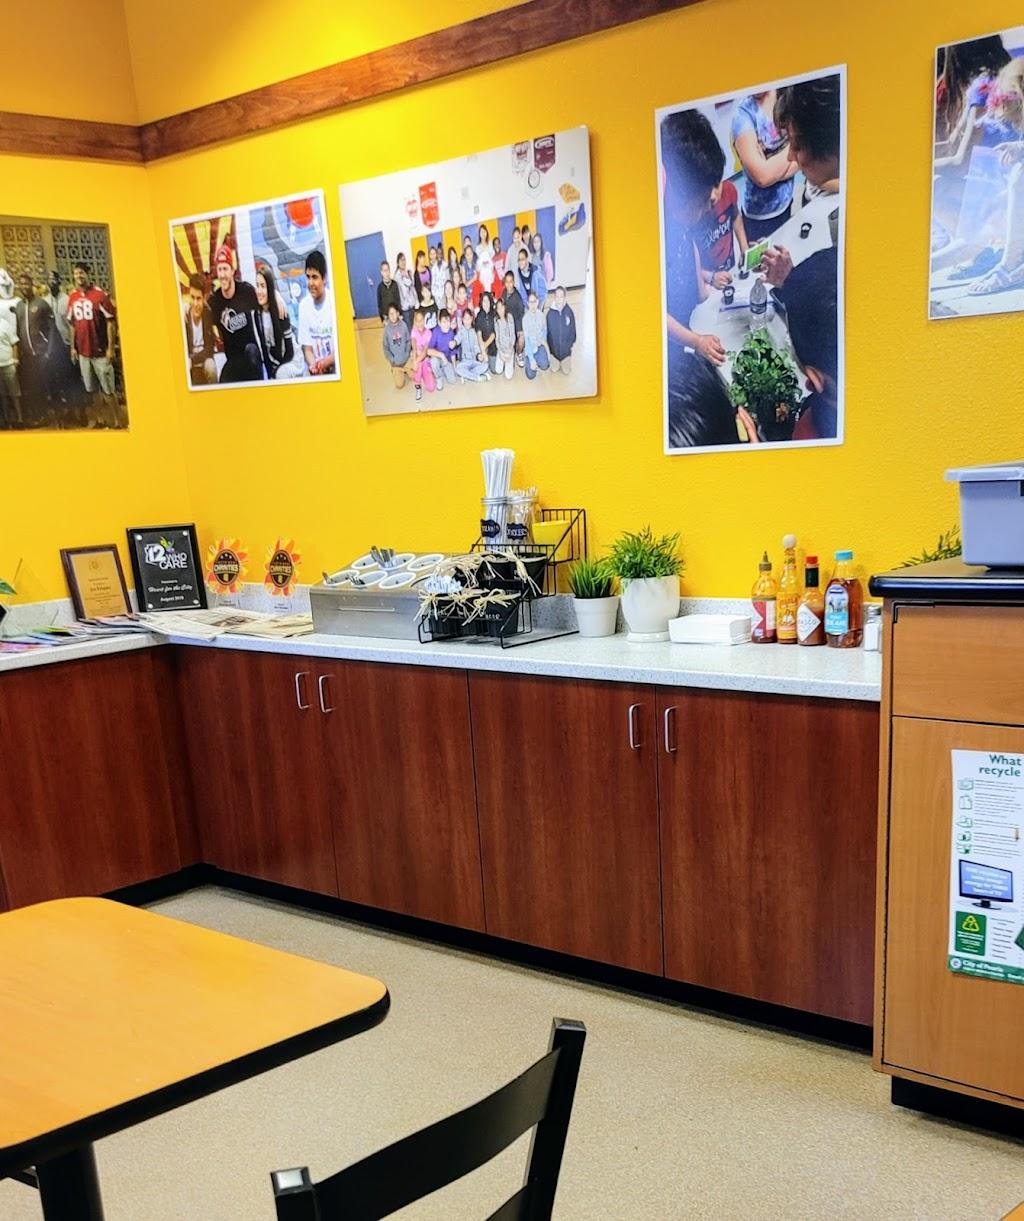 Java Grounds - cafe  | Photo 3 of 3 | Address: 8401 W Monroe St, Peoria, AZ 85345, USA | Phone: (623) 773-7880